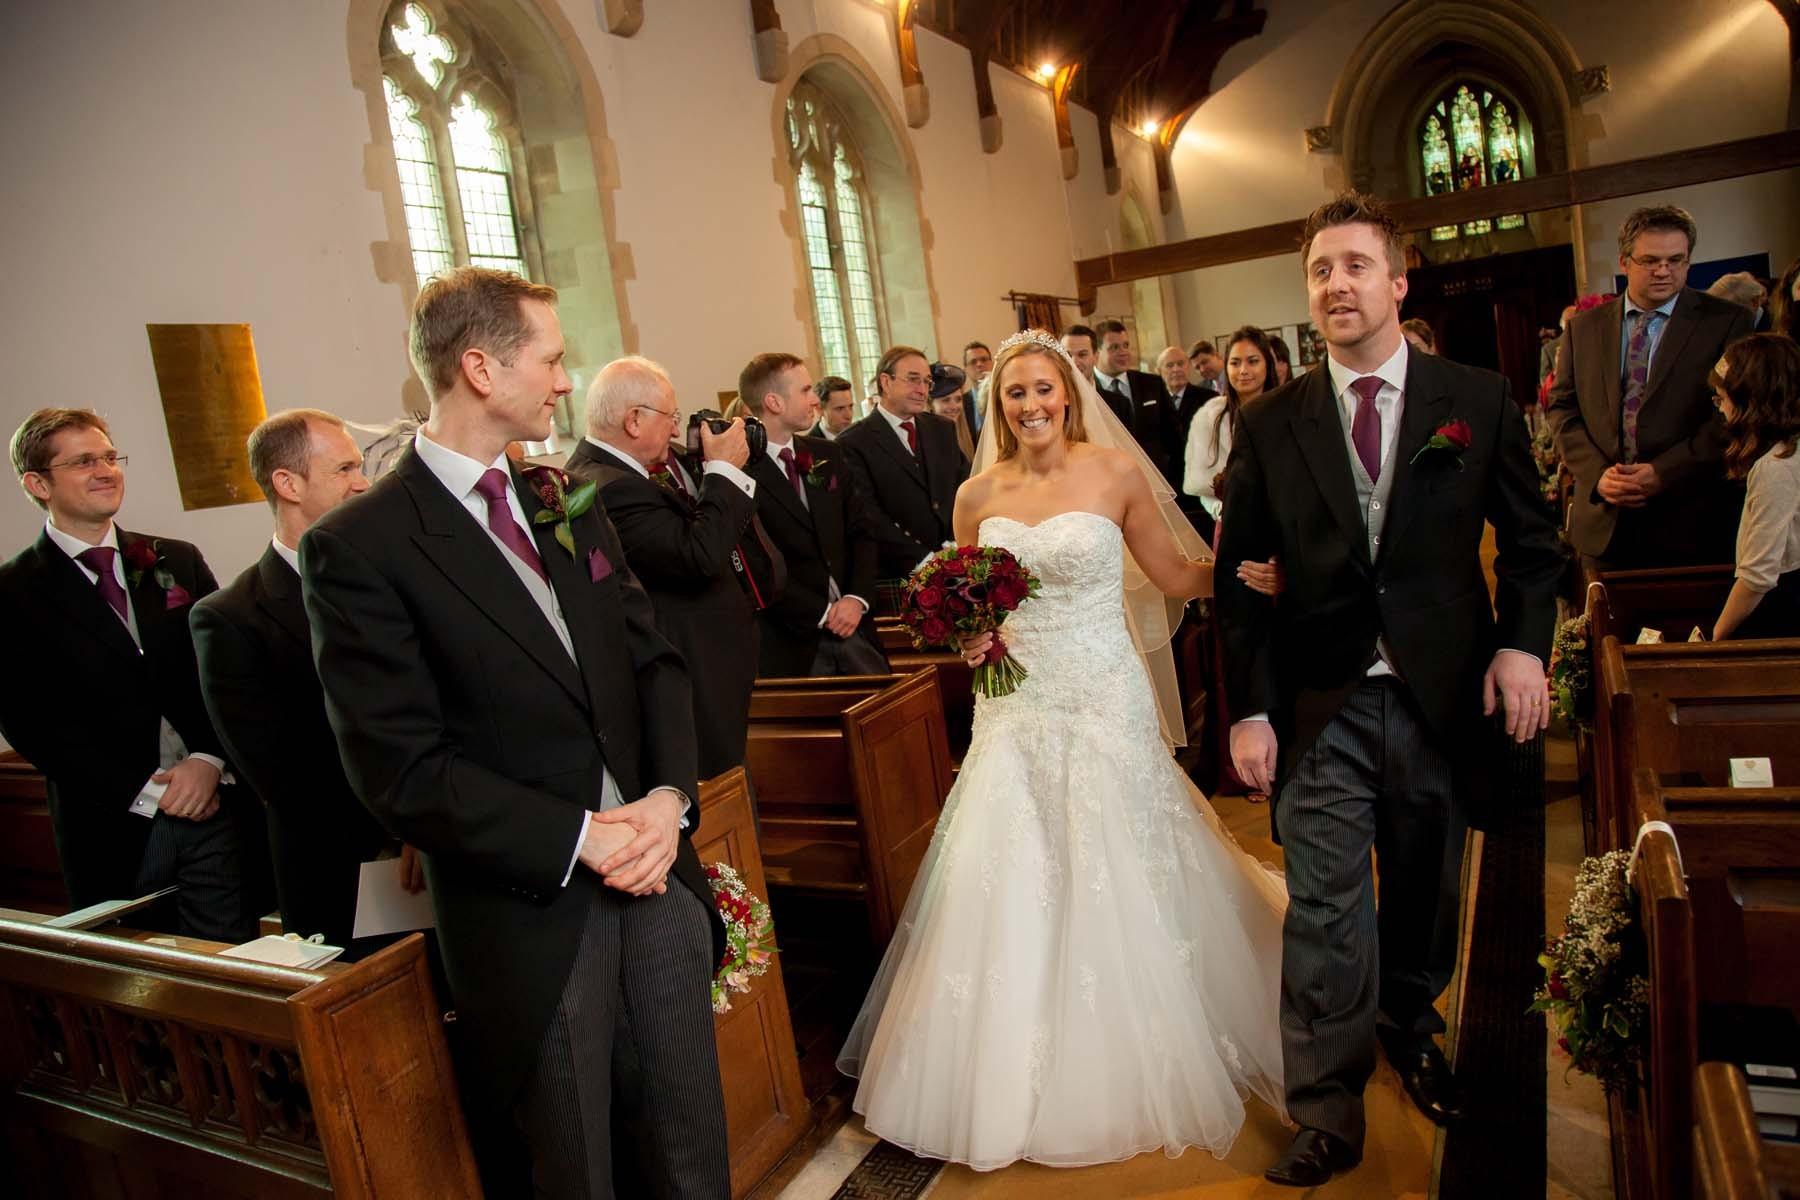 Sussex & Surrey Wedding Photographer - Ceremony (9)